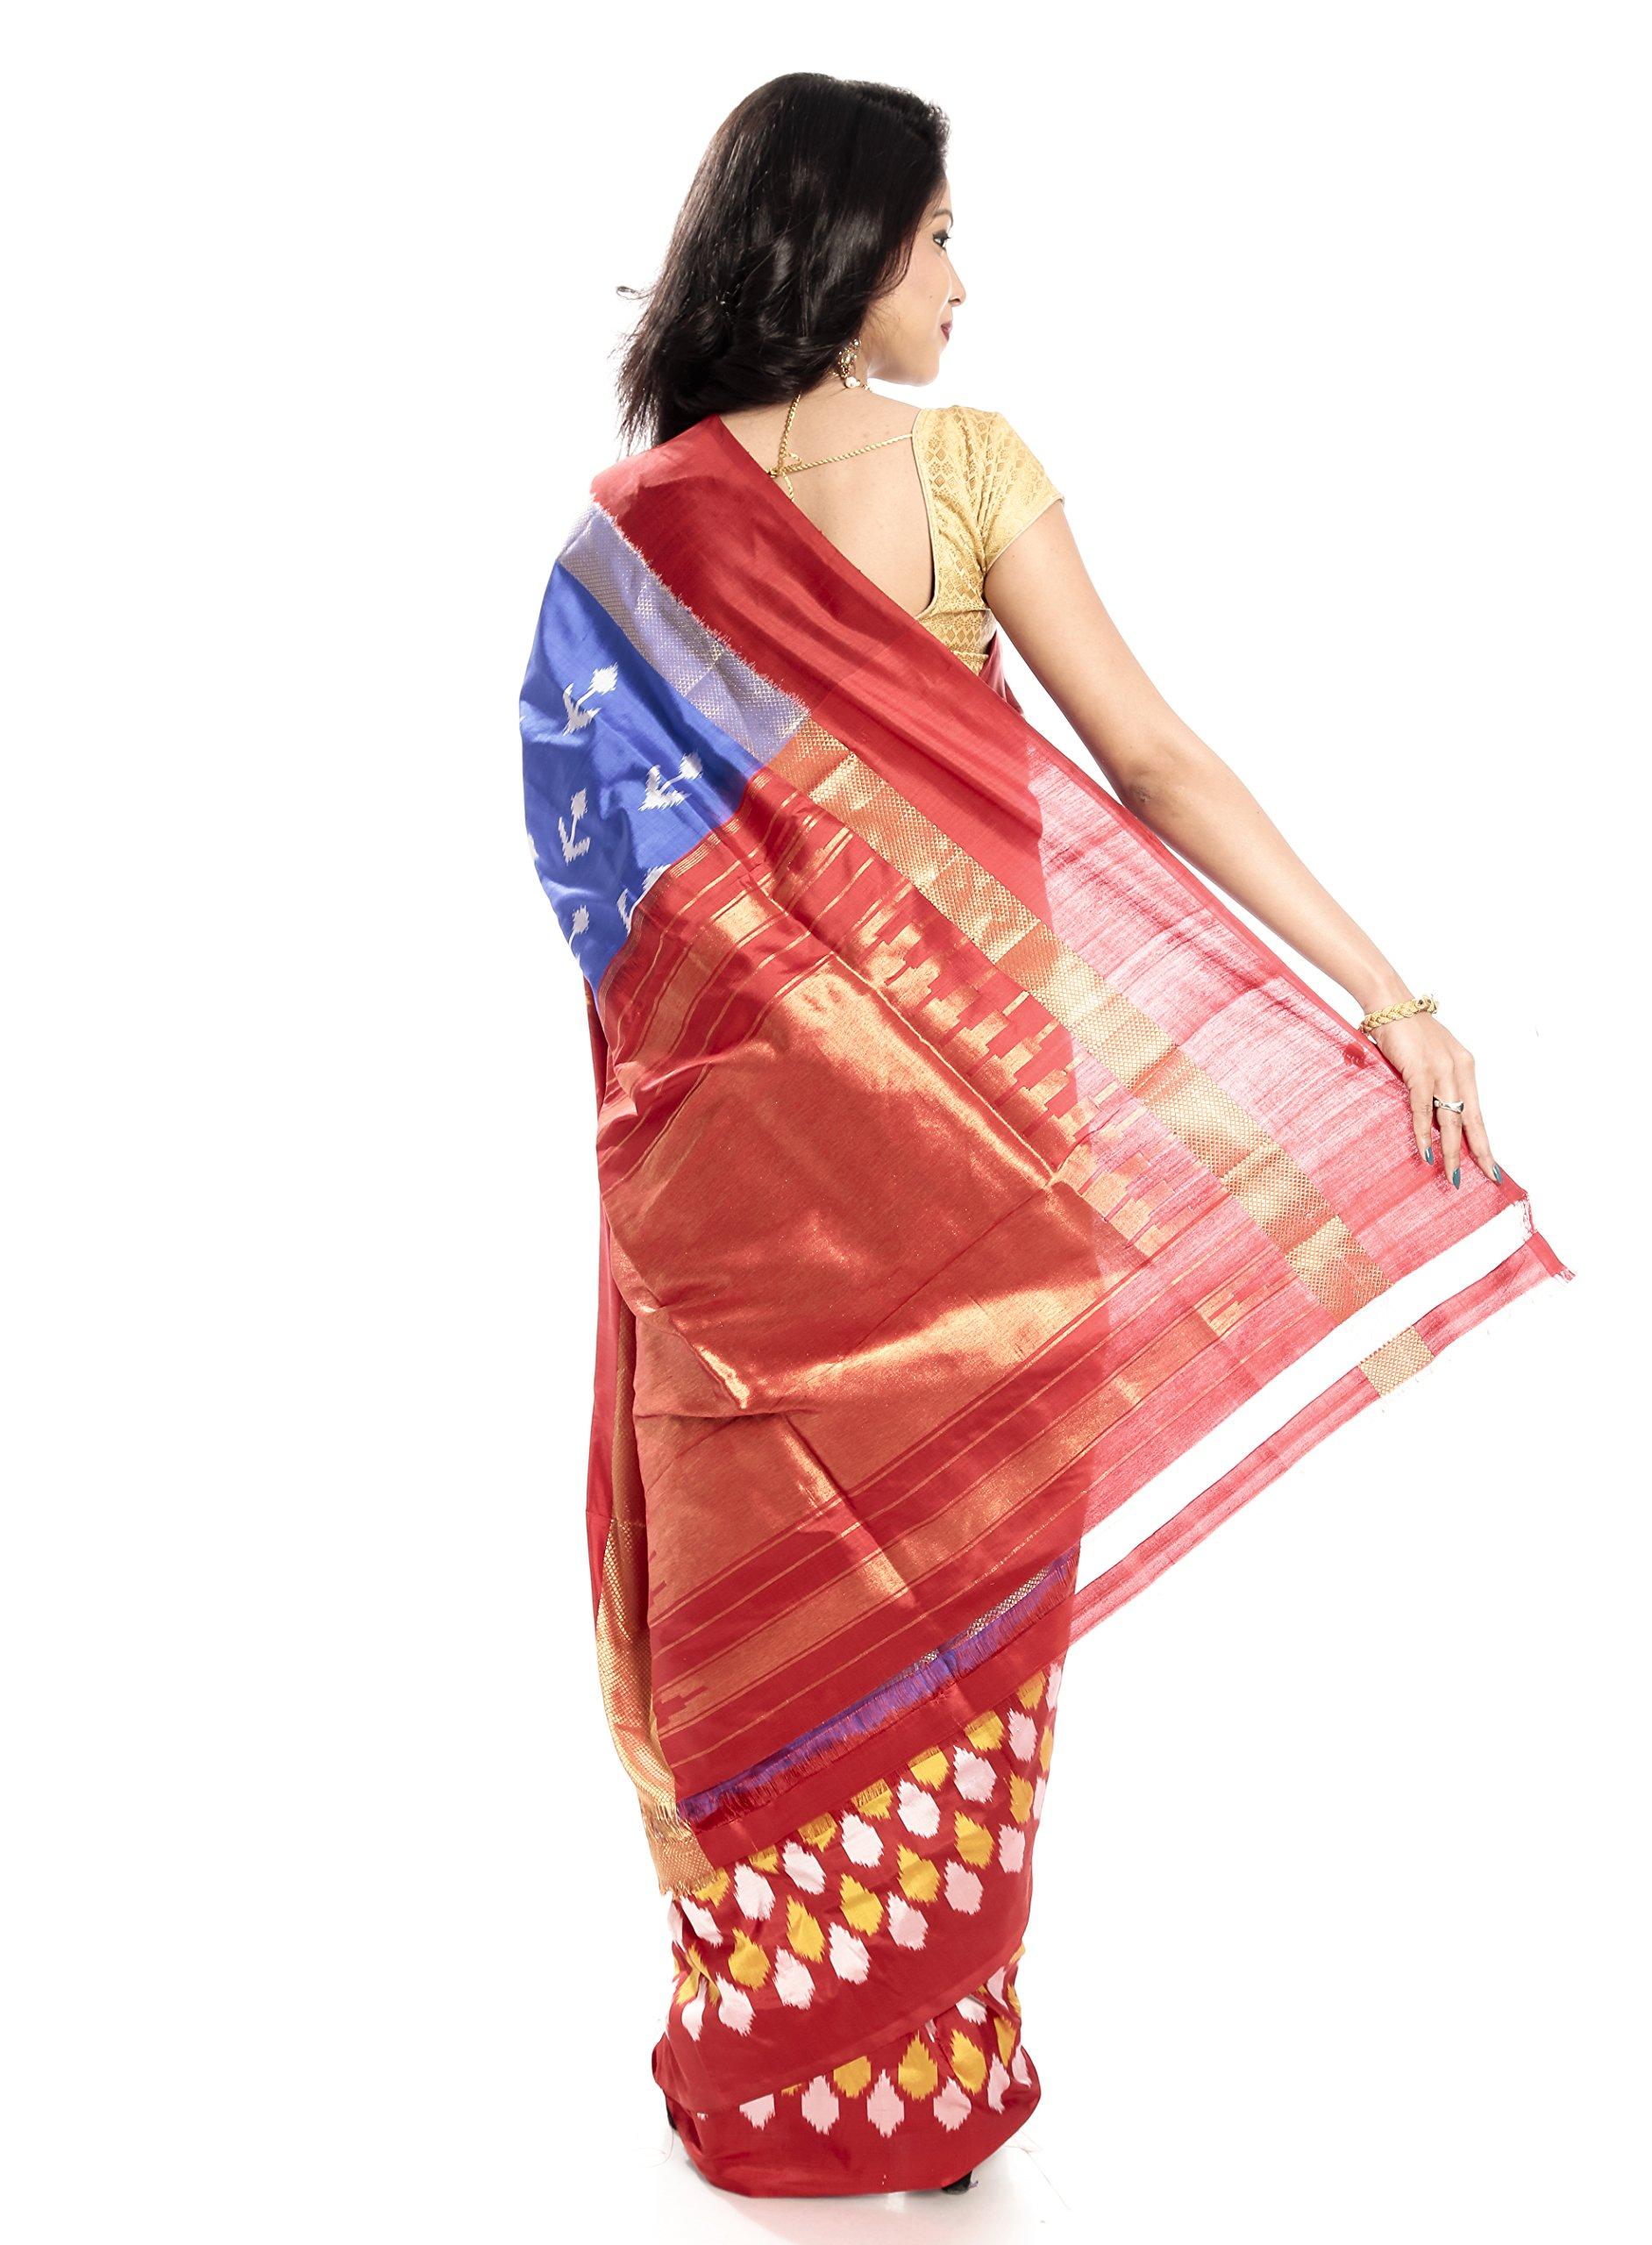 Mandakini — Indian Women's Pochampally - Handloom - Ikat Pure Silk Saree (Blue-Reddish Orange ) (MK355) by Mandakini (Image #5)